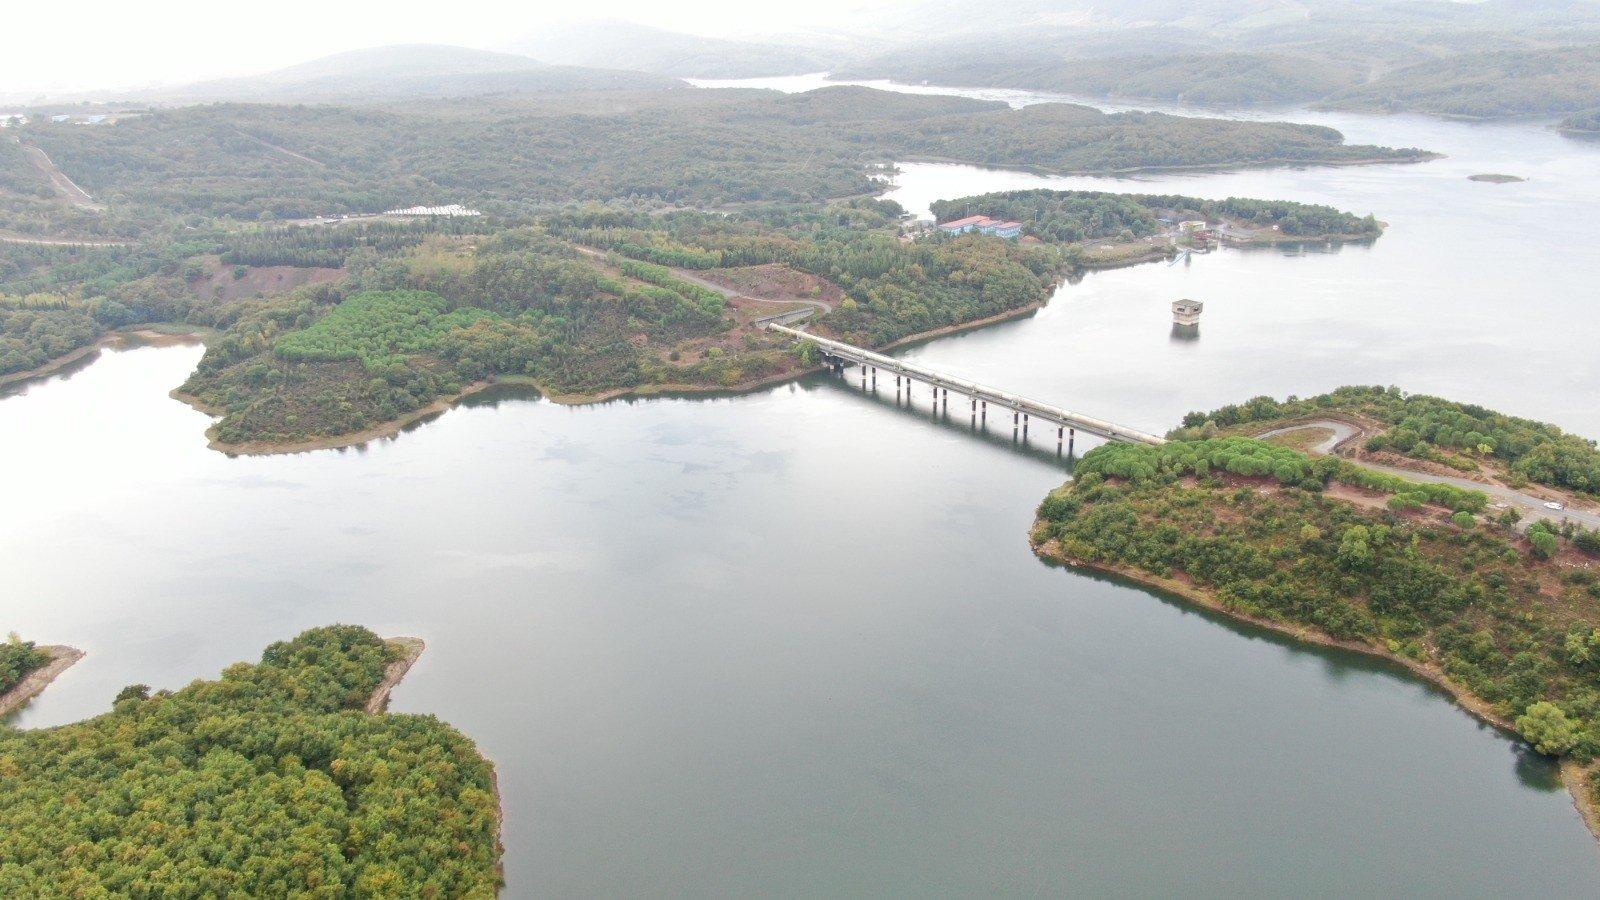 A view of the reservoir of Ömerli Dam, in Istanbul, Turkey, Sept. 24, 2021. (İHA PHOTO)